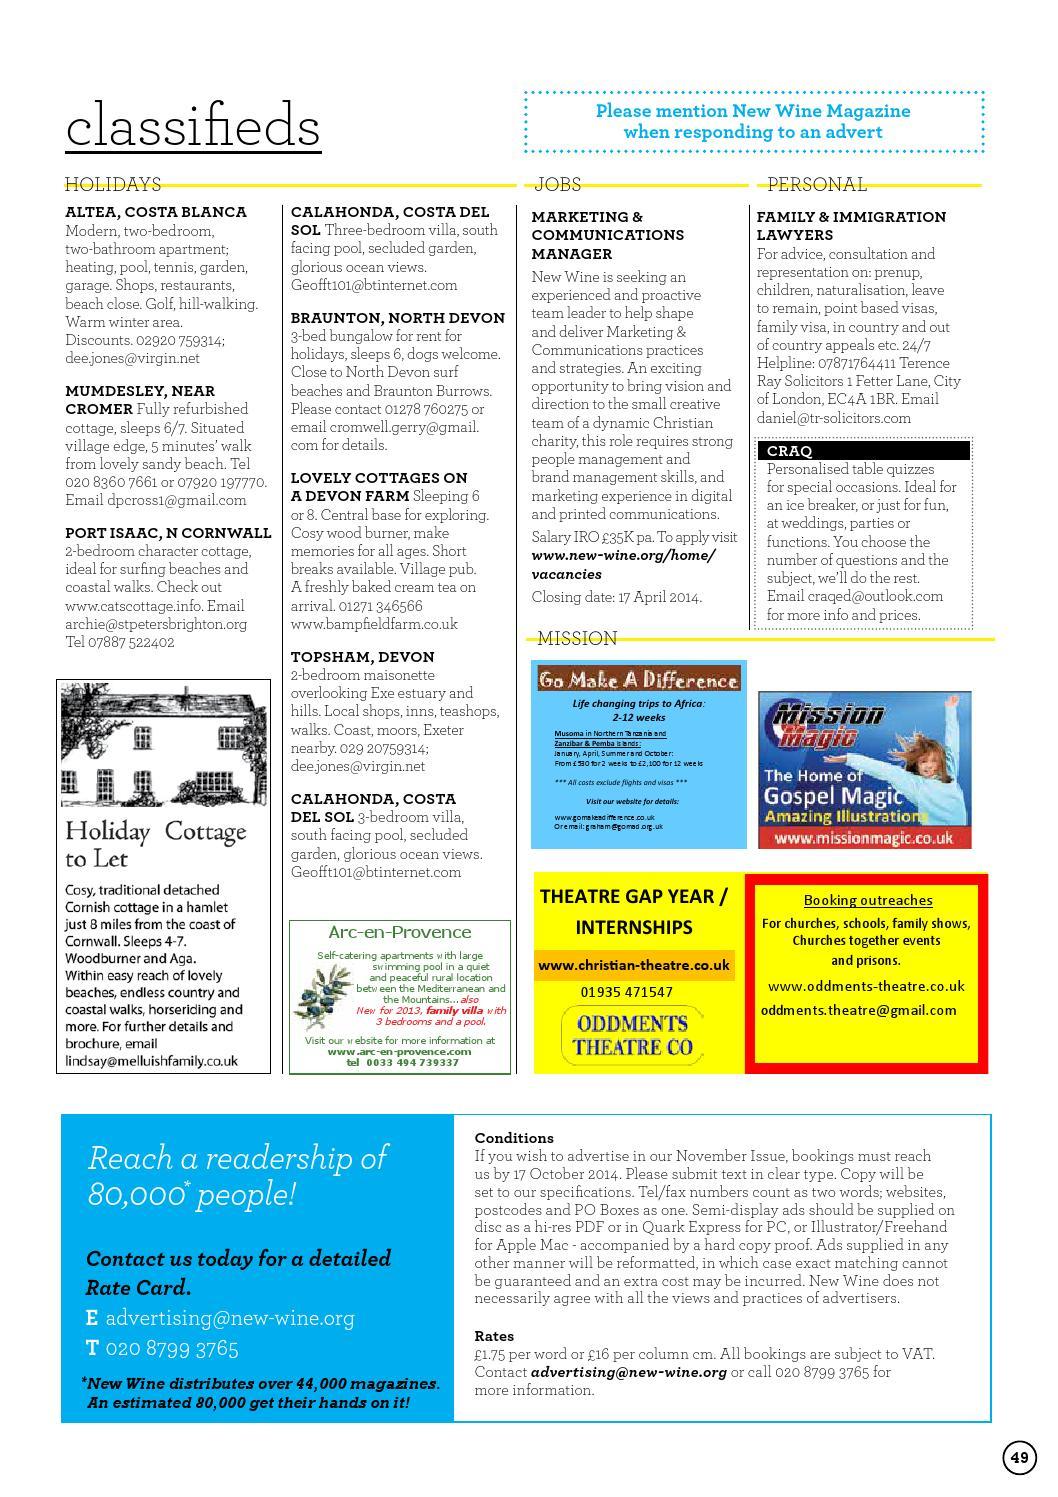 New Wine Magazine - Issue 60 - Spring 2014 by New Wine - issuu